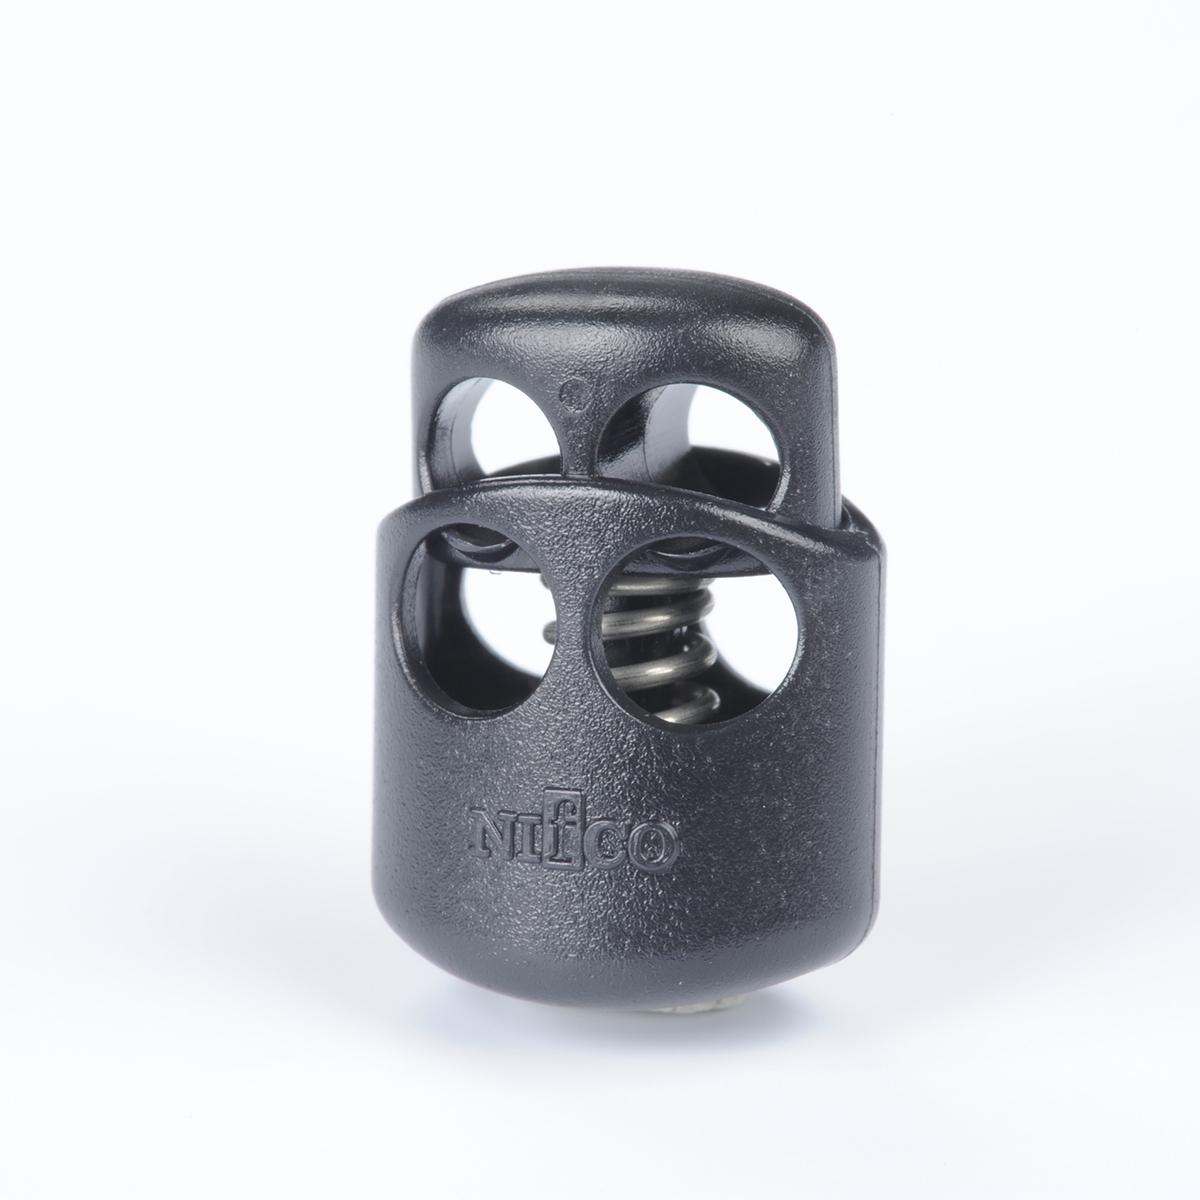 nifco  コードロック CL24-MS 3㎜ゴムひも2本用 黒 2個入り